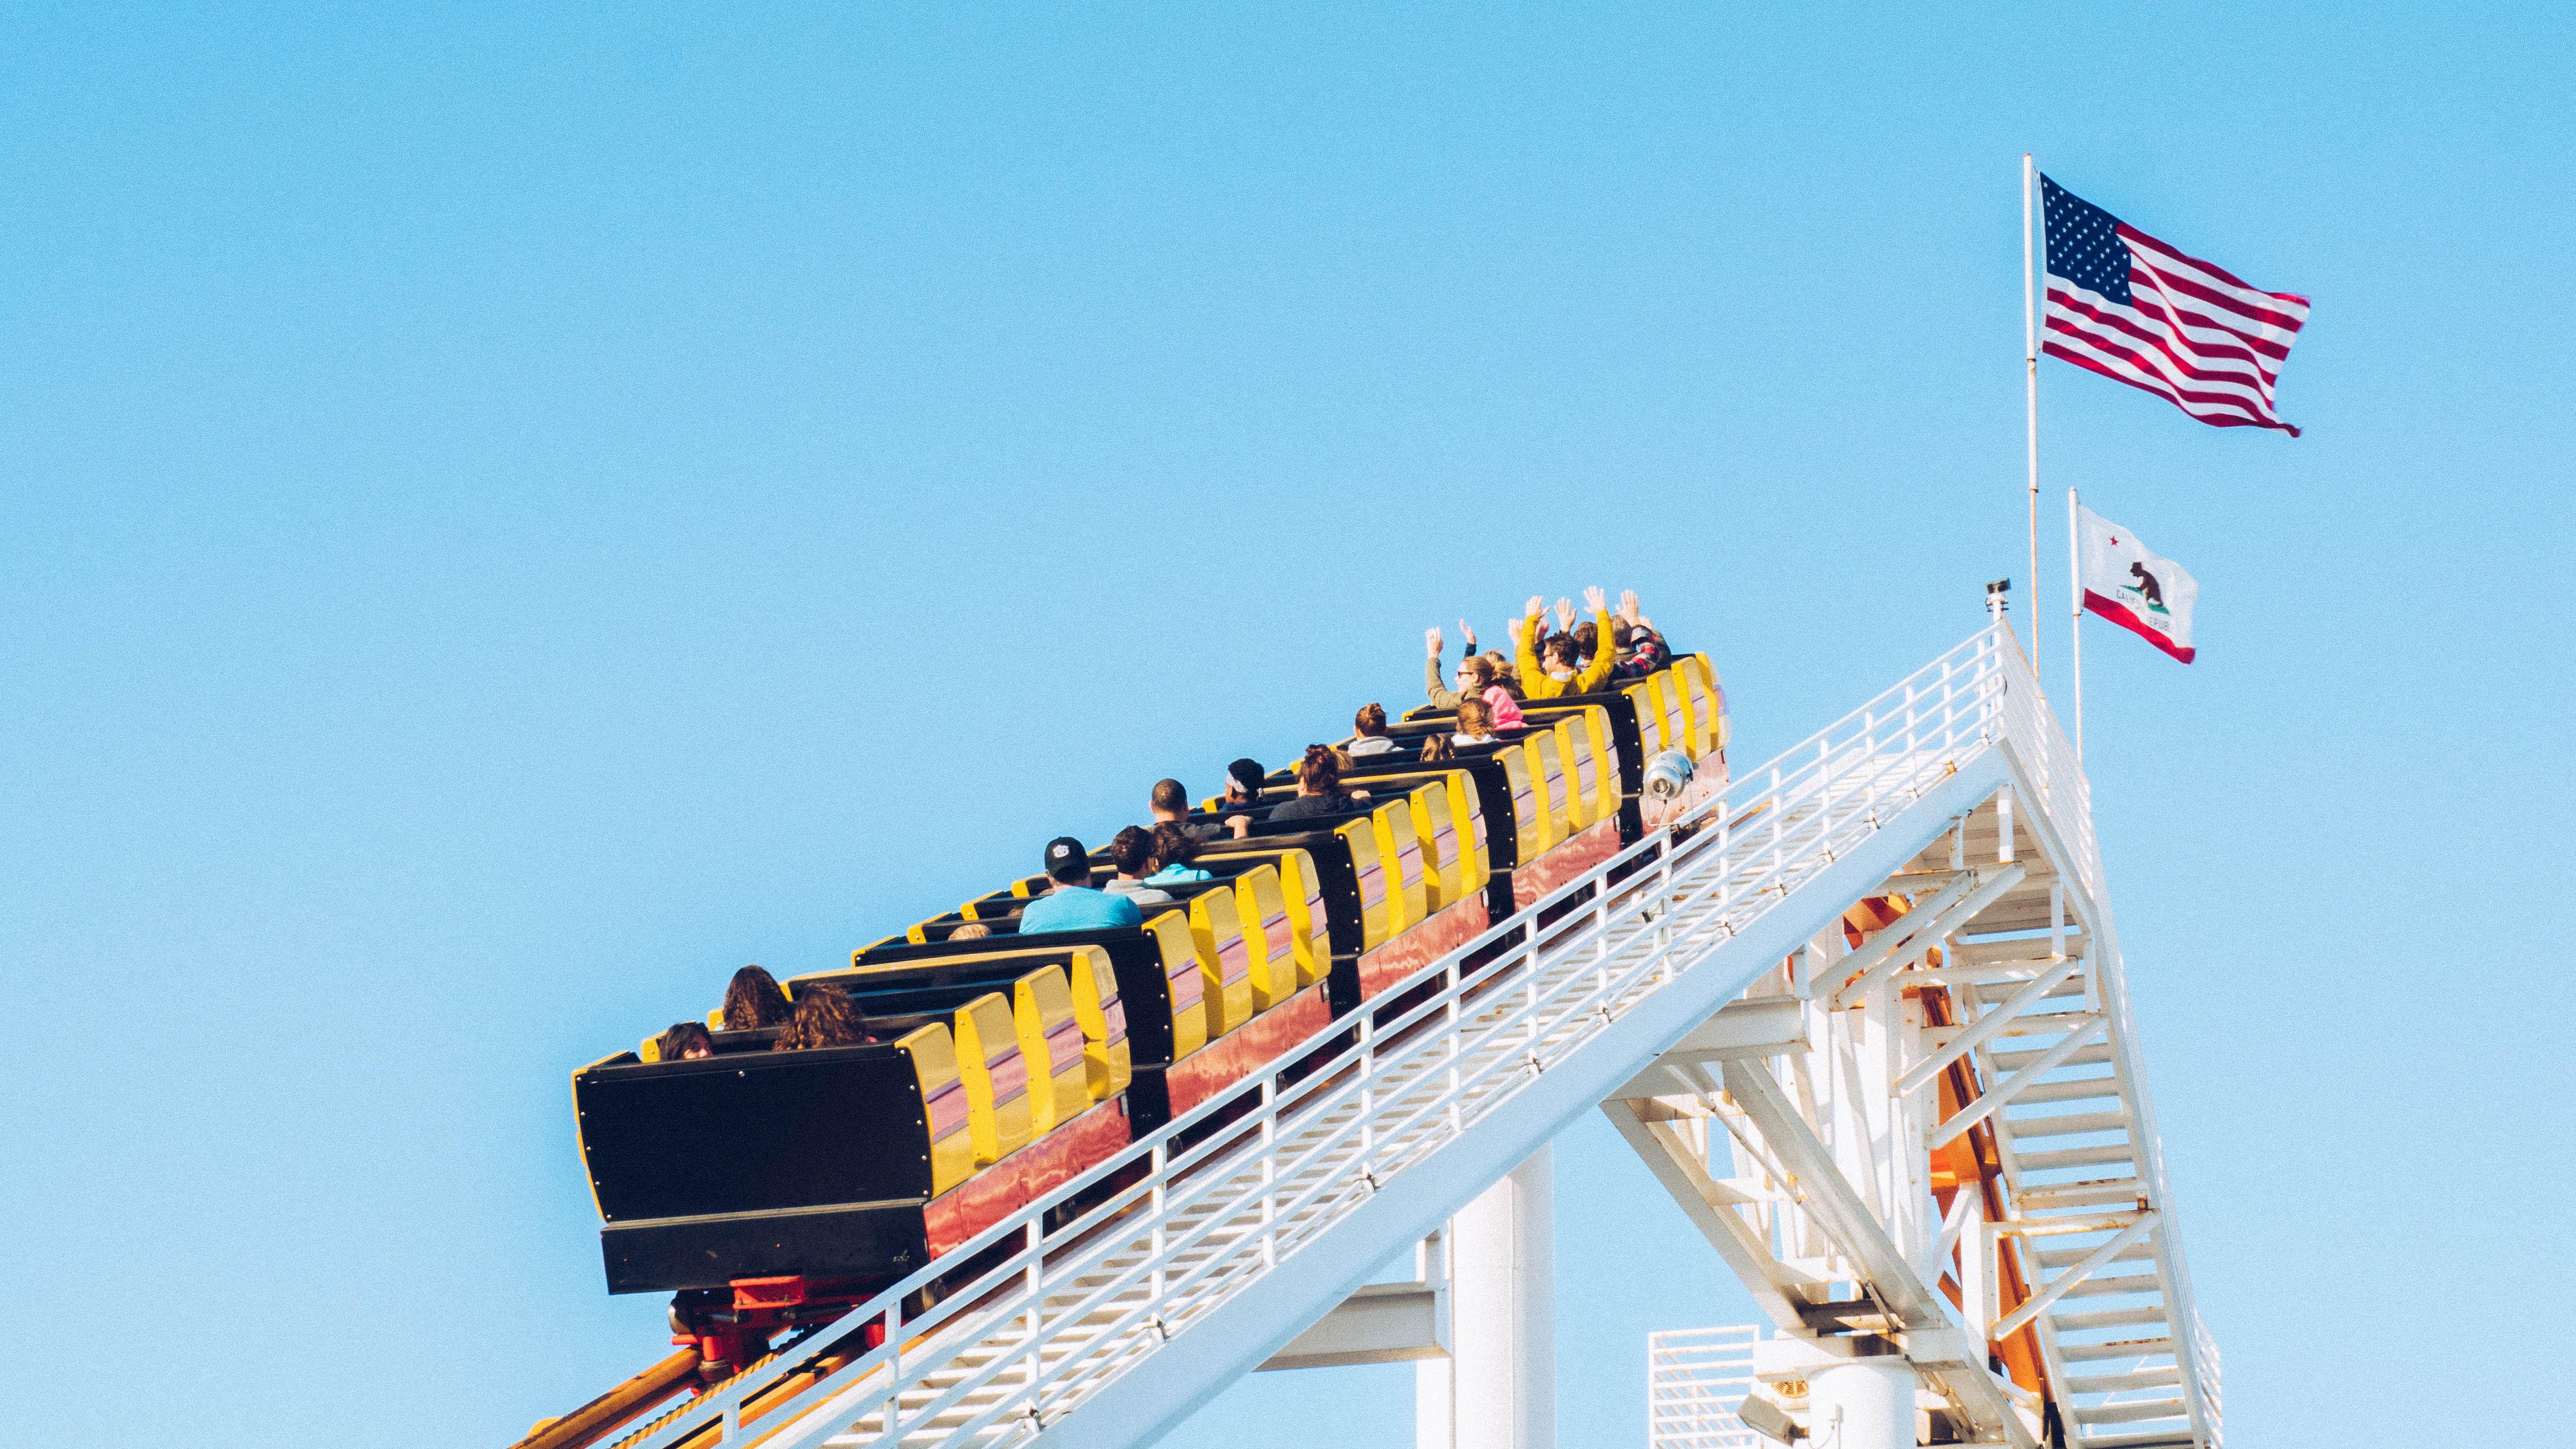 Free Images : vehicle, amusement park, roller coaster ...